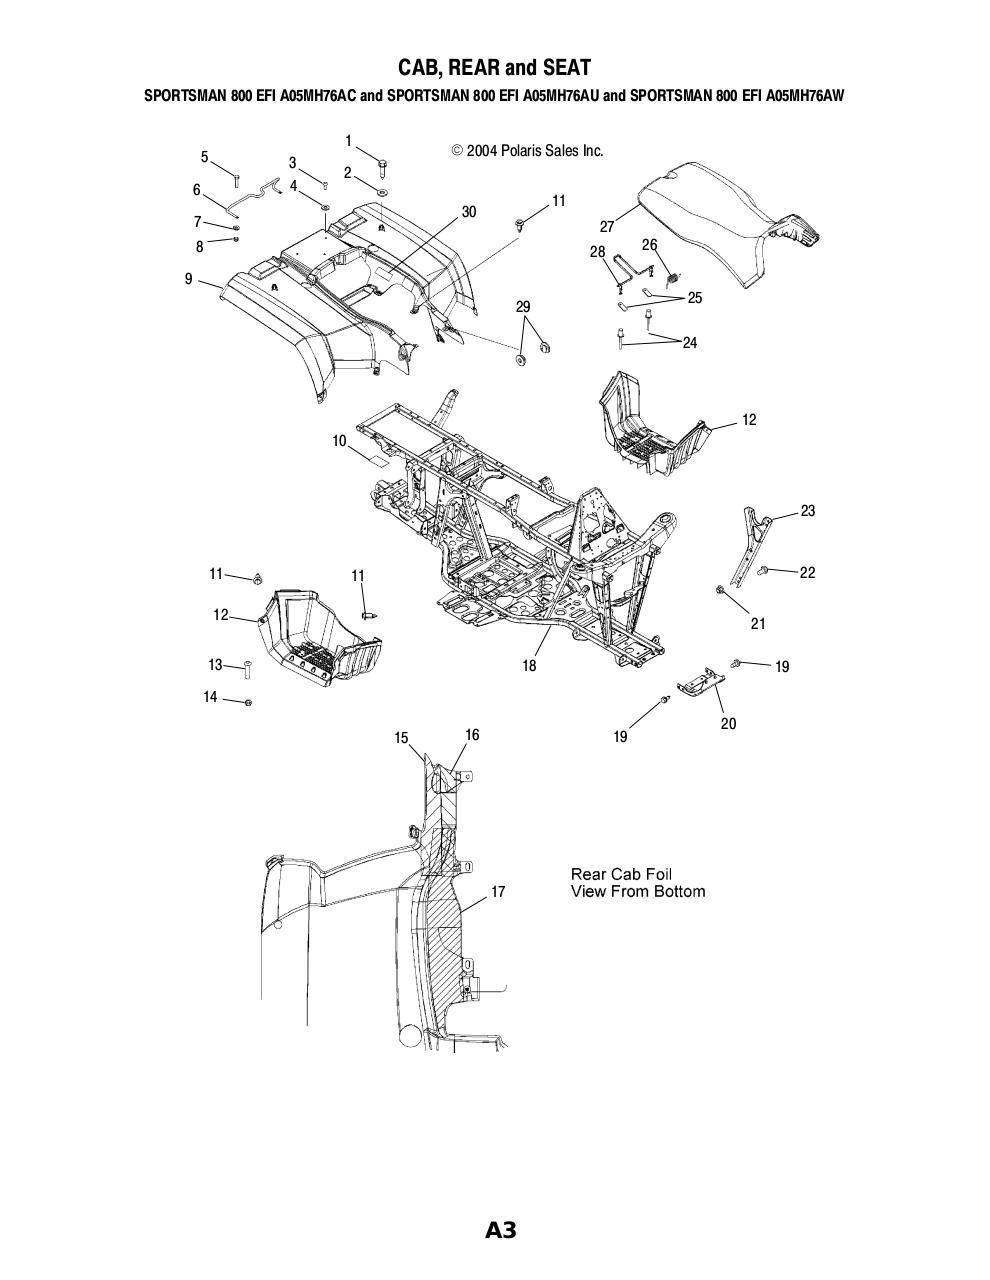 2003 polari sportsman 500 ho wiring diagram - best place ... polaris 2004 600 twin wiring diagram polaris 600 snowmobile wiring diagram 2011